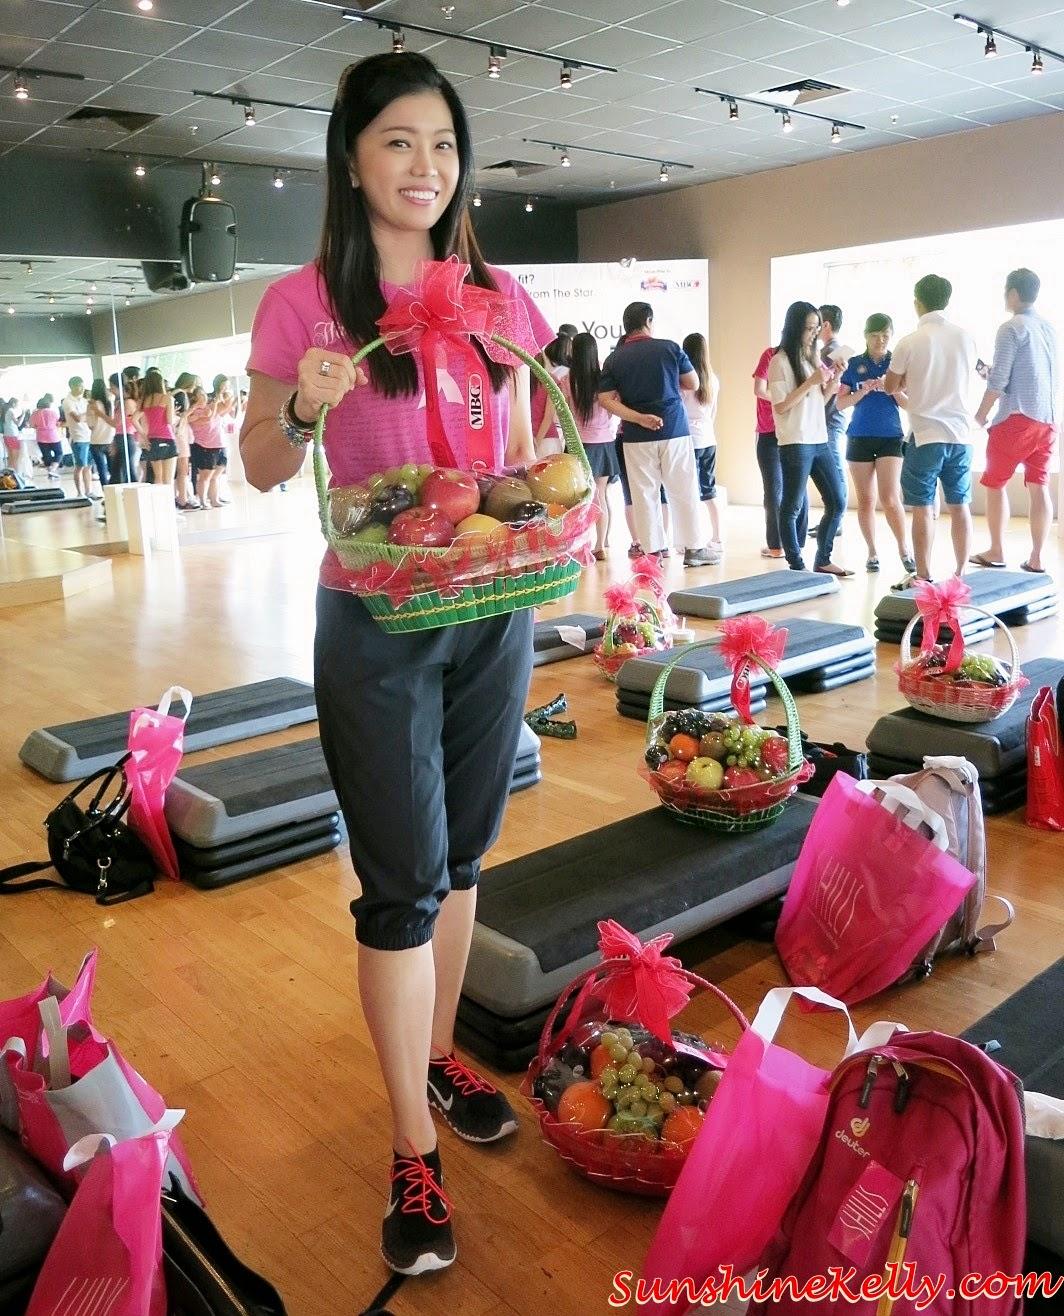 MBG Fruit Basket, MBG Fruits, MBG Fruits Hamper, SHILLS Miracle Lift Beauty Workshop, shills, anosa, dot dot, miracle lift